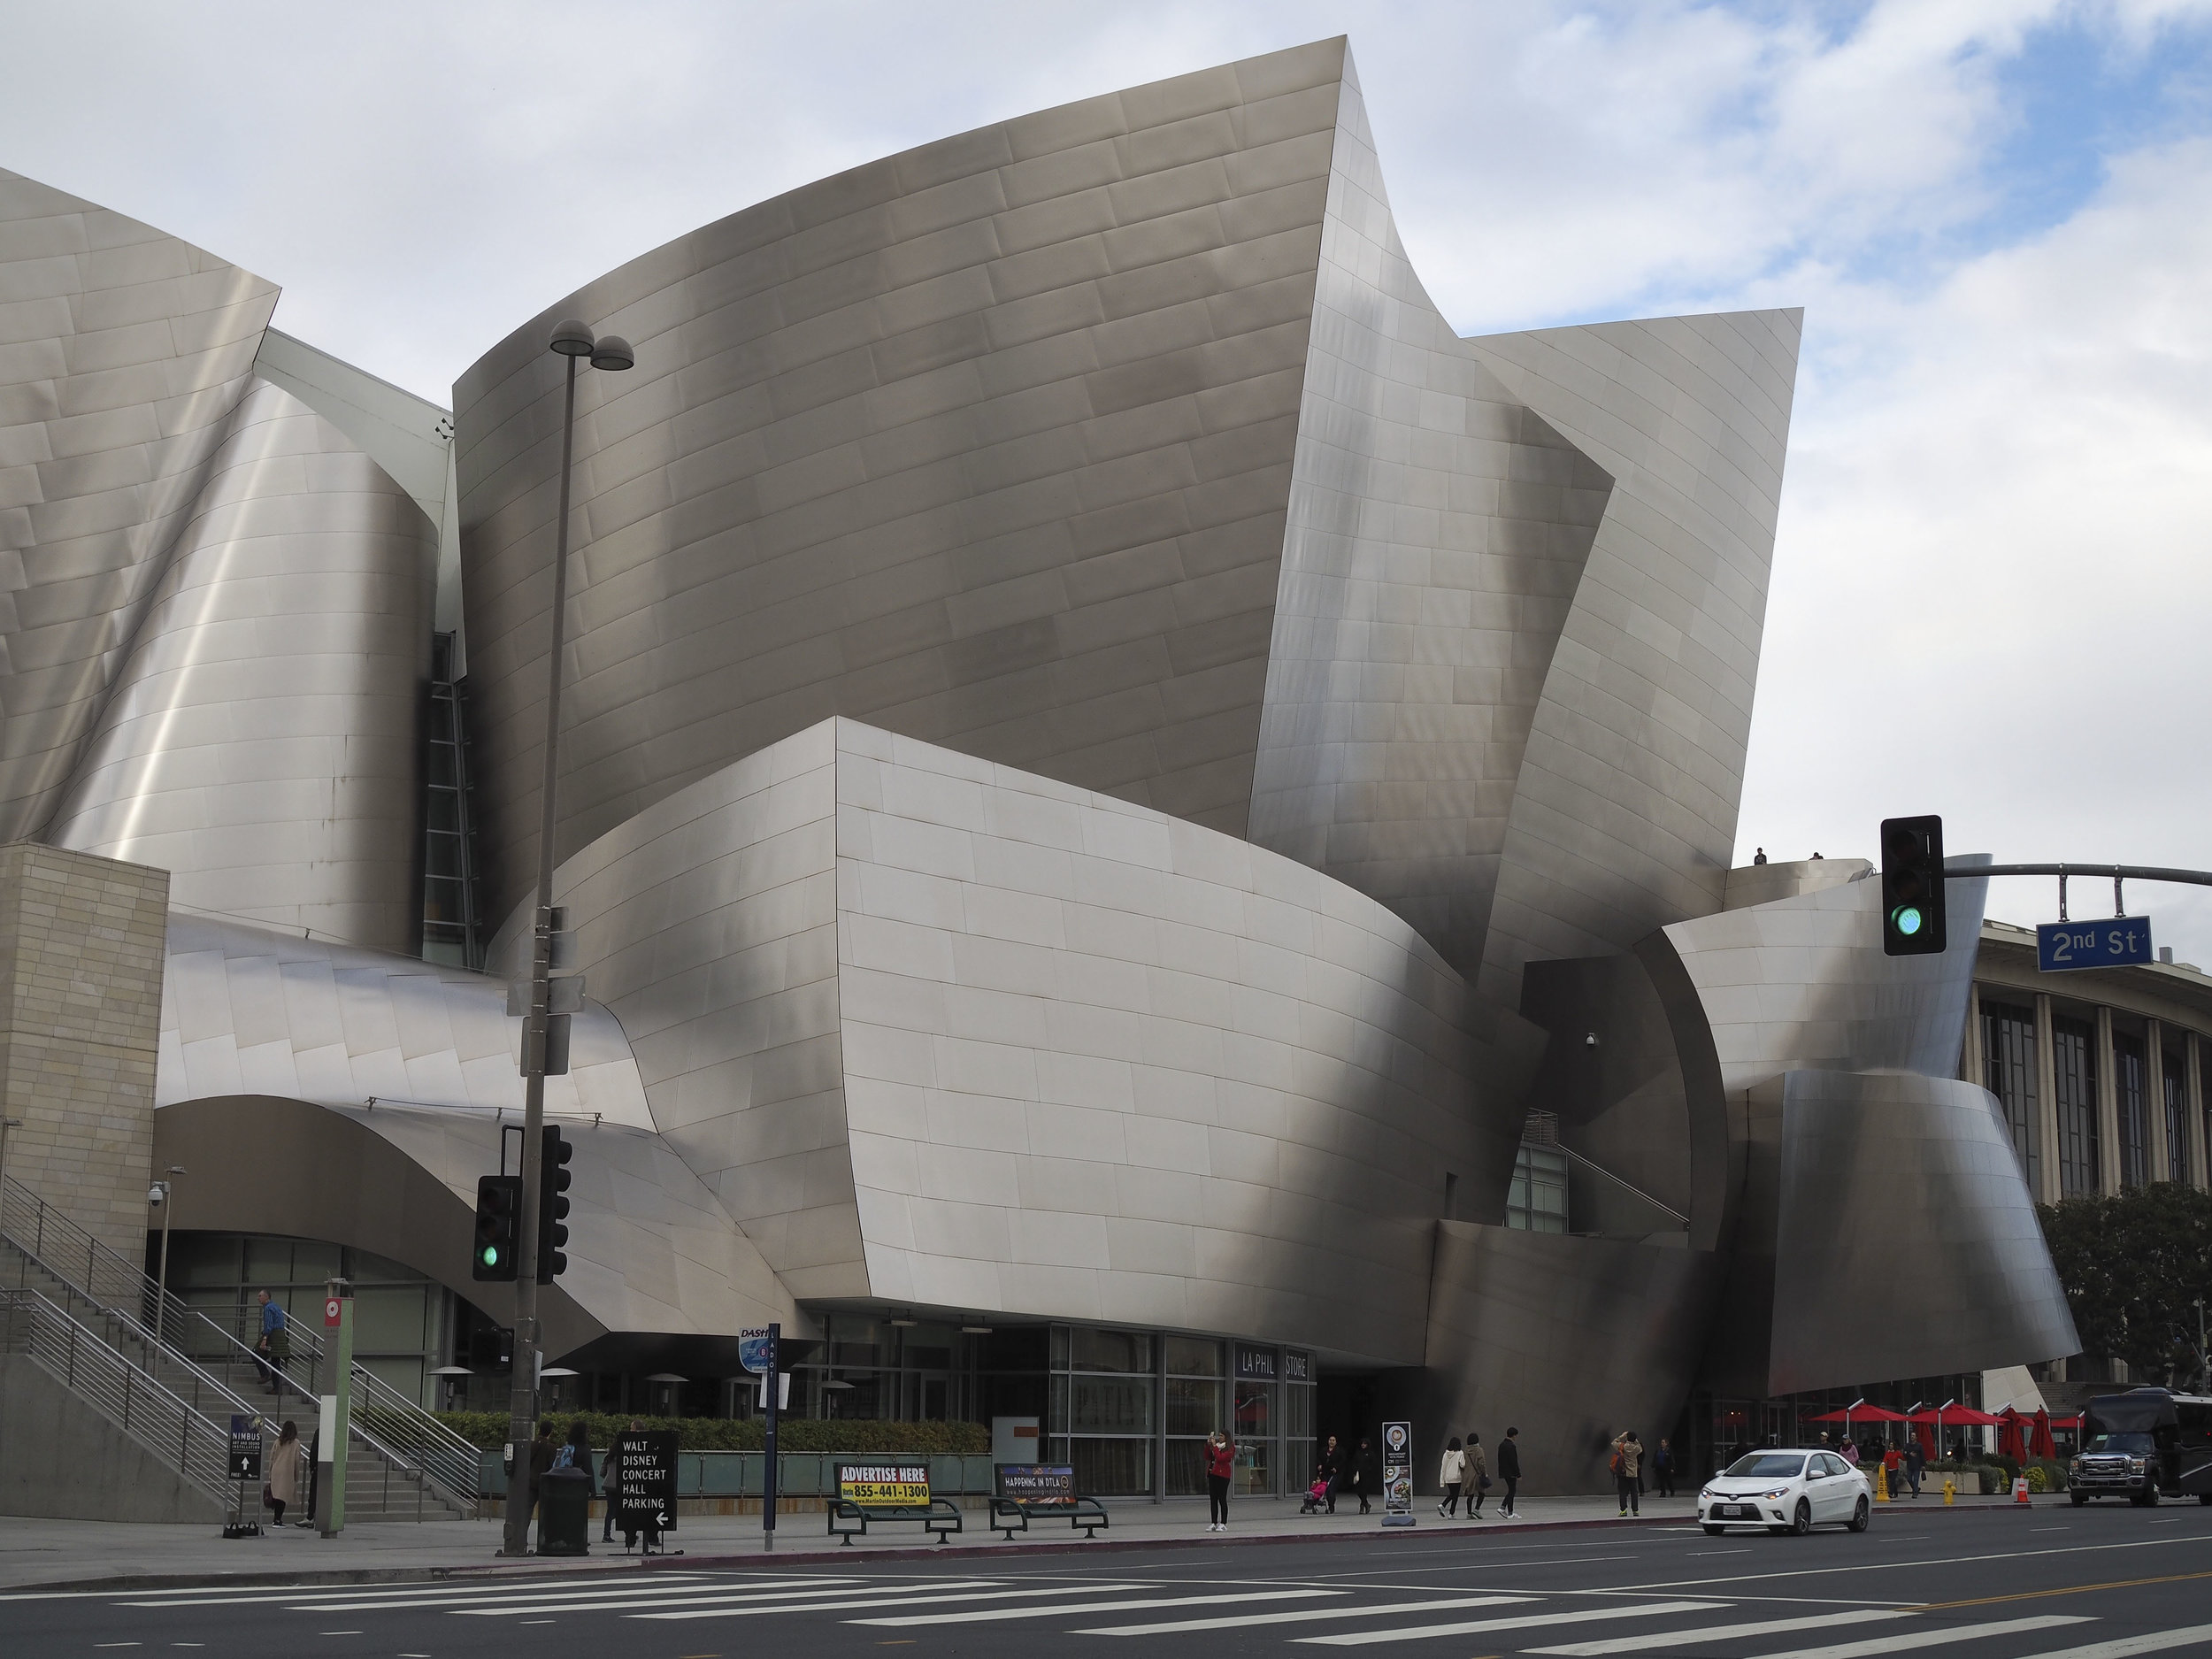 The beautiful Disney Concert Hall.